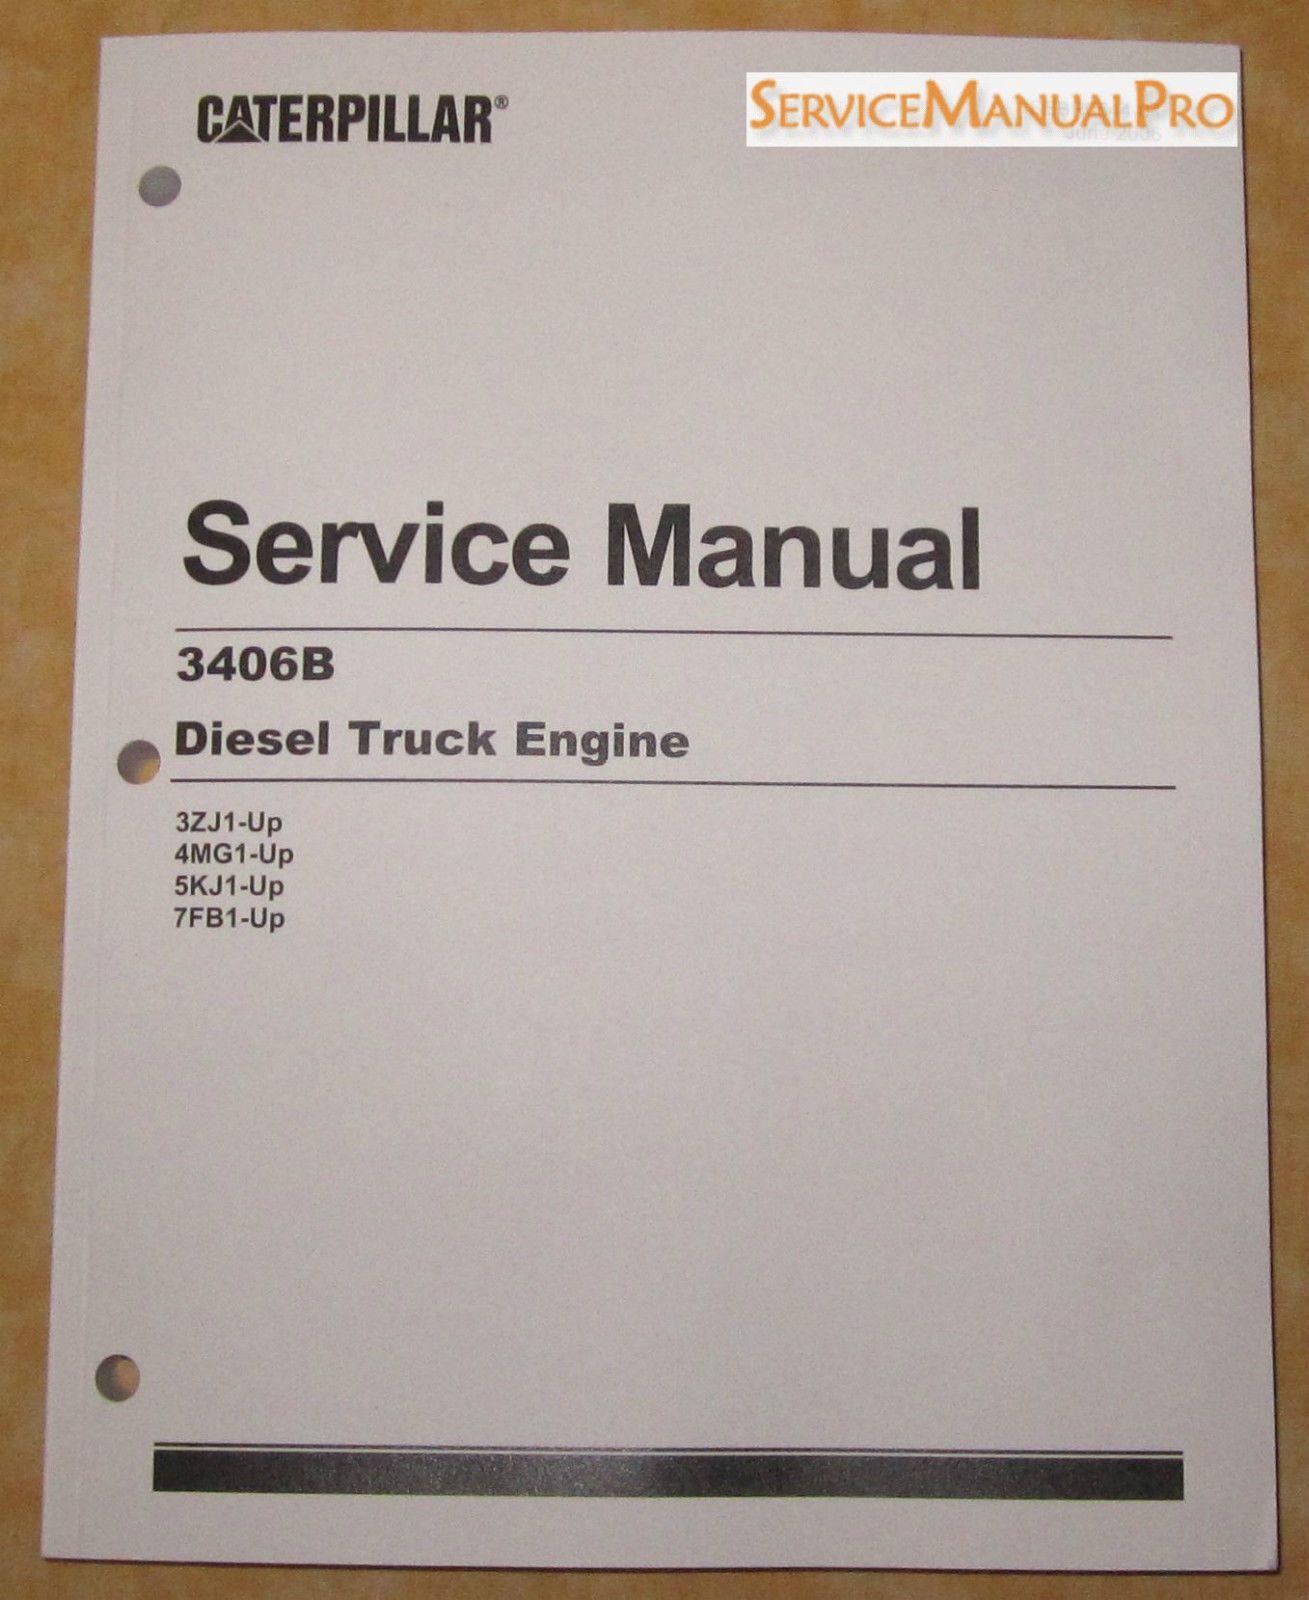 heavy equipment sebr0544 new oem caterpillar 3406b truck engine rh pinterest com 3406B Cat Service Manual caterpillar 3406b service manual download